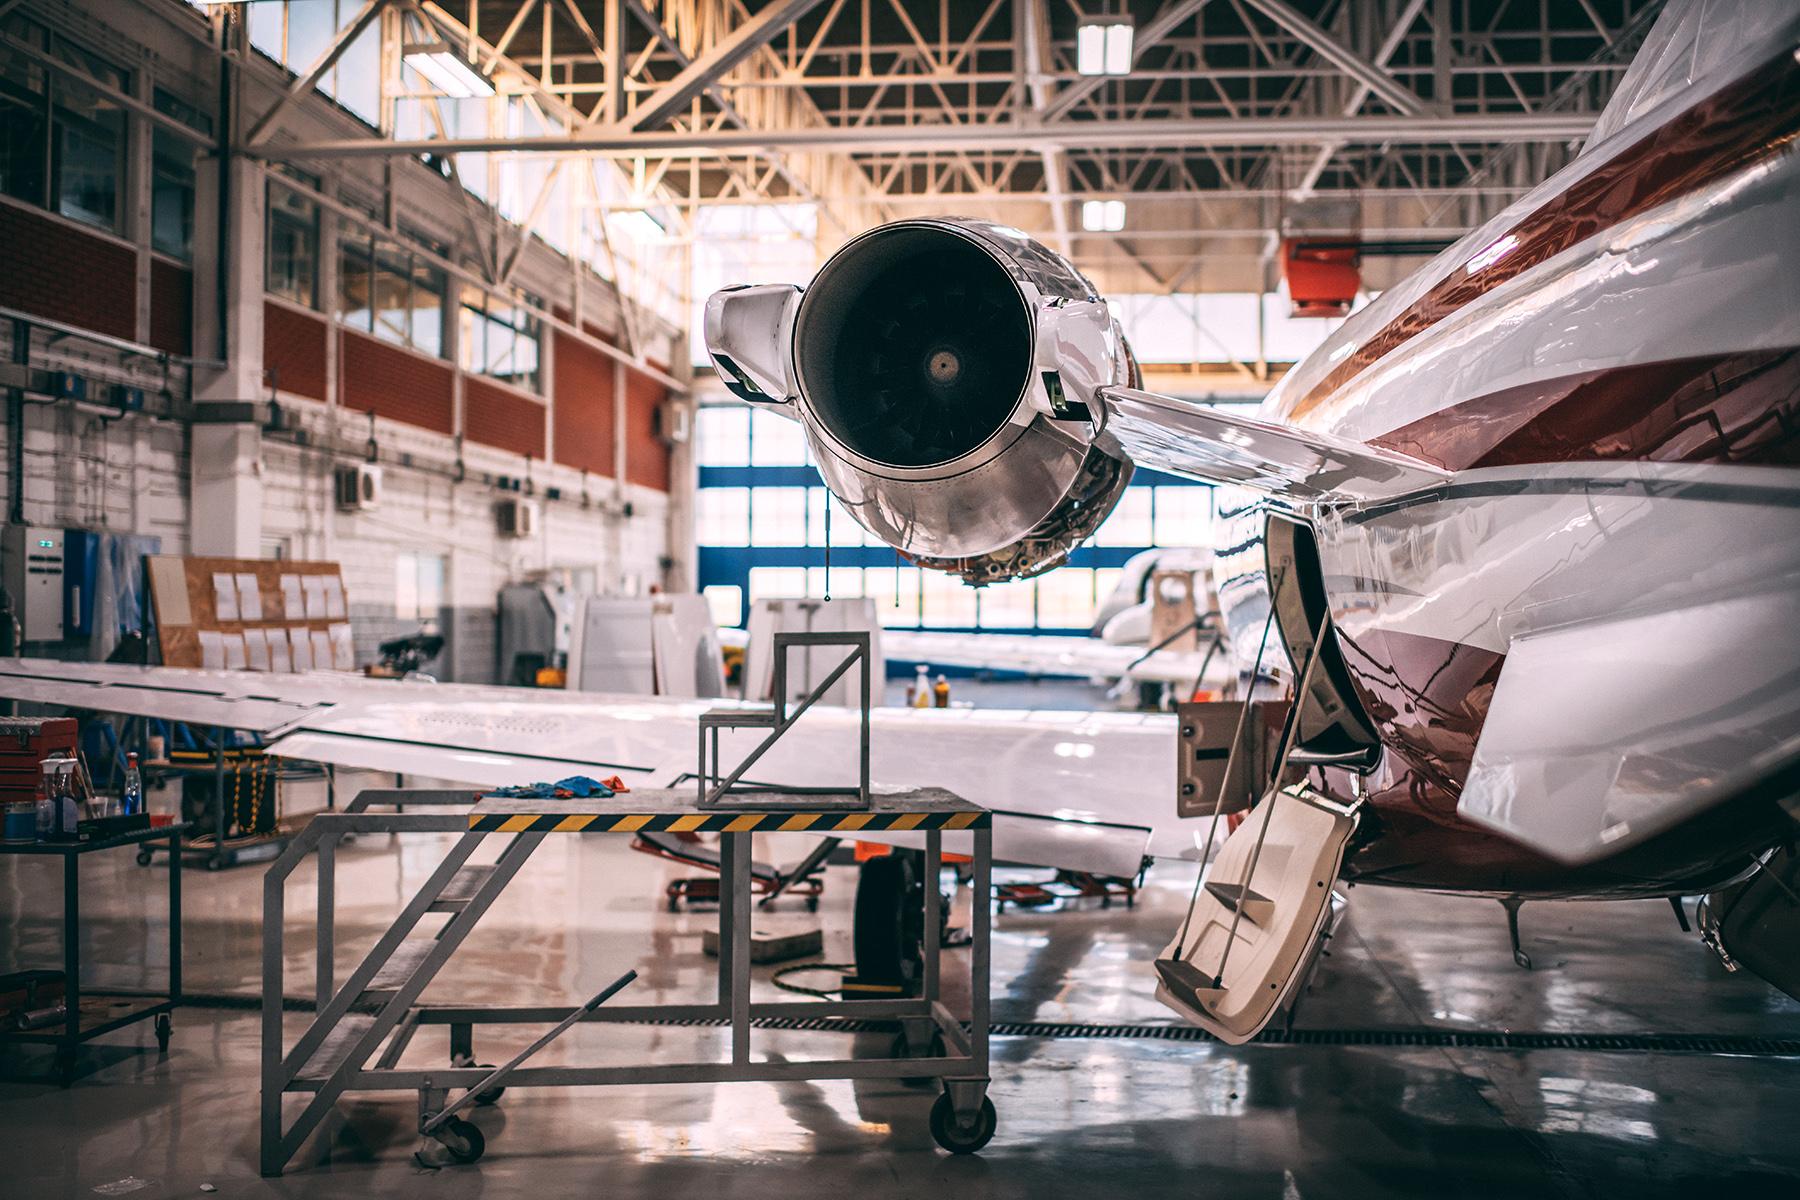 Air Craft Wing